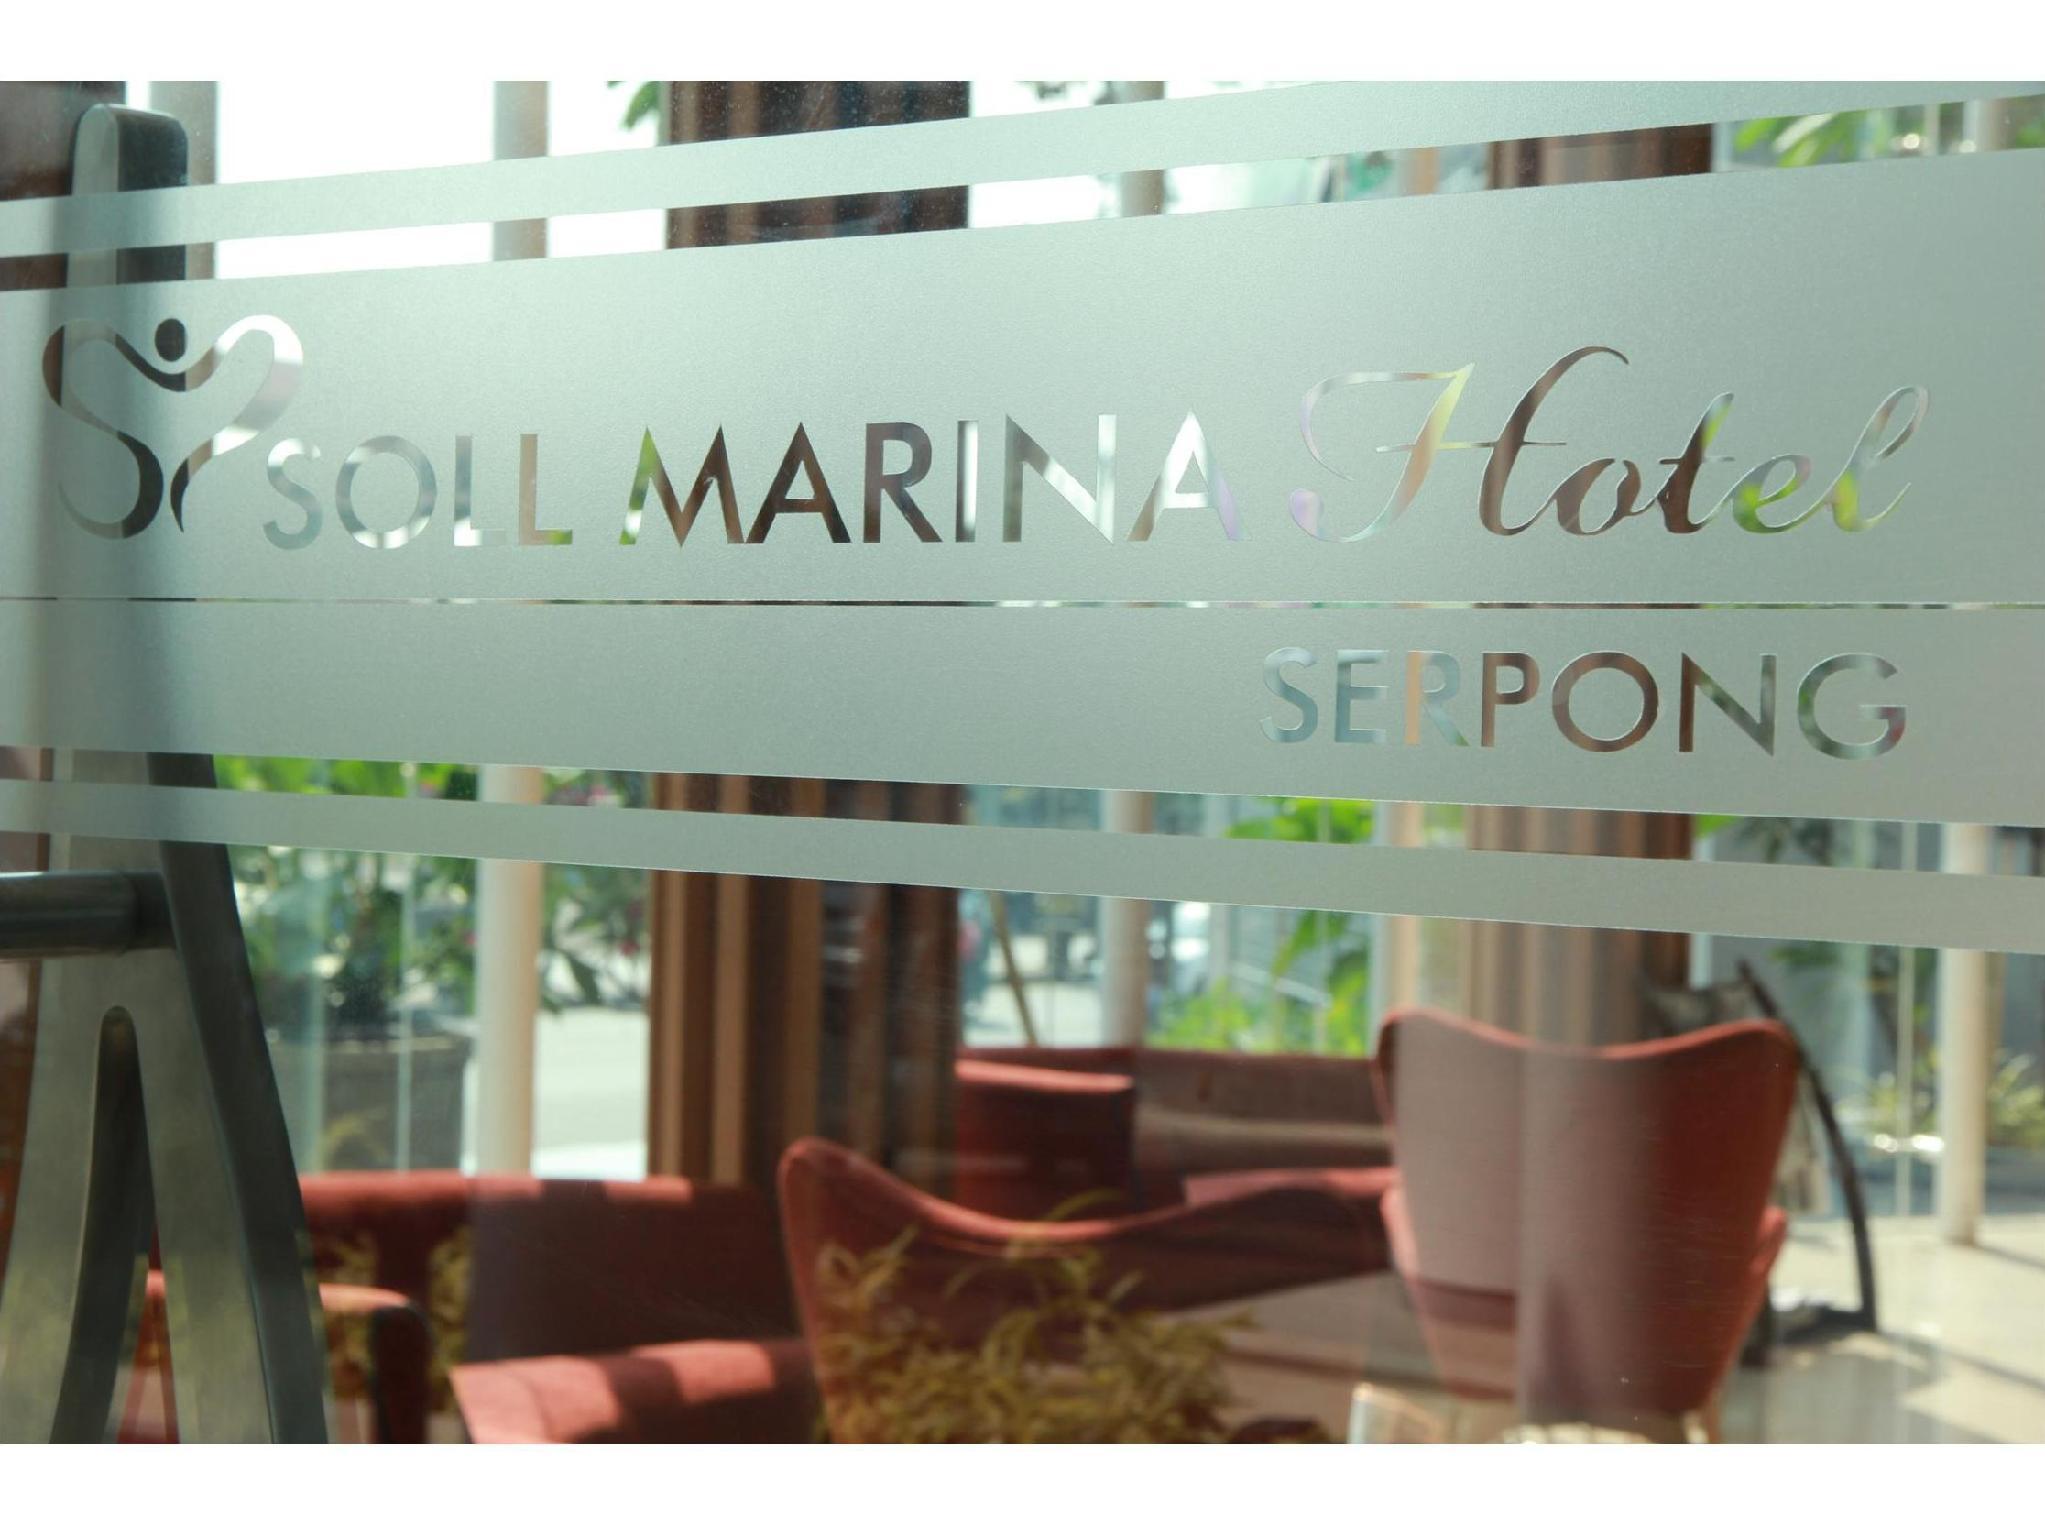 Soll Marina